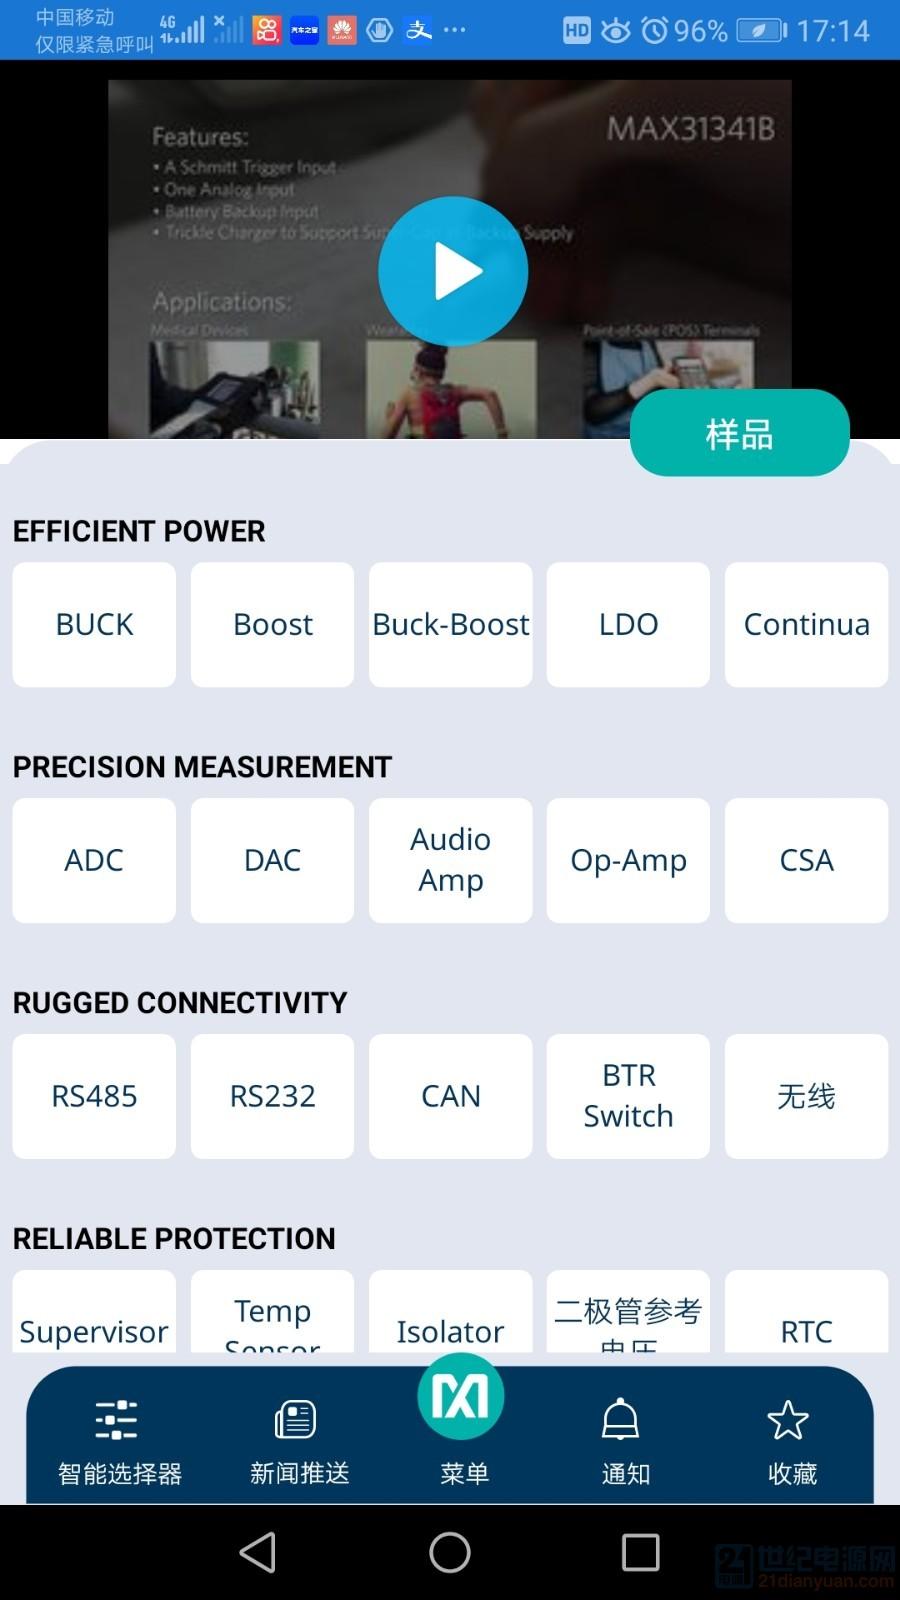 Screenshot_20210319_171443_com.maximintegrated.mobile.jpg